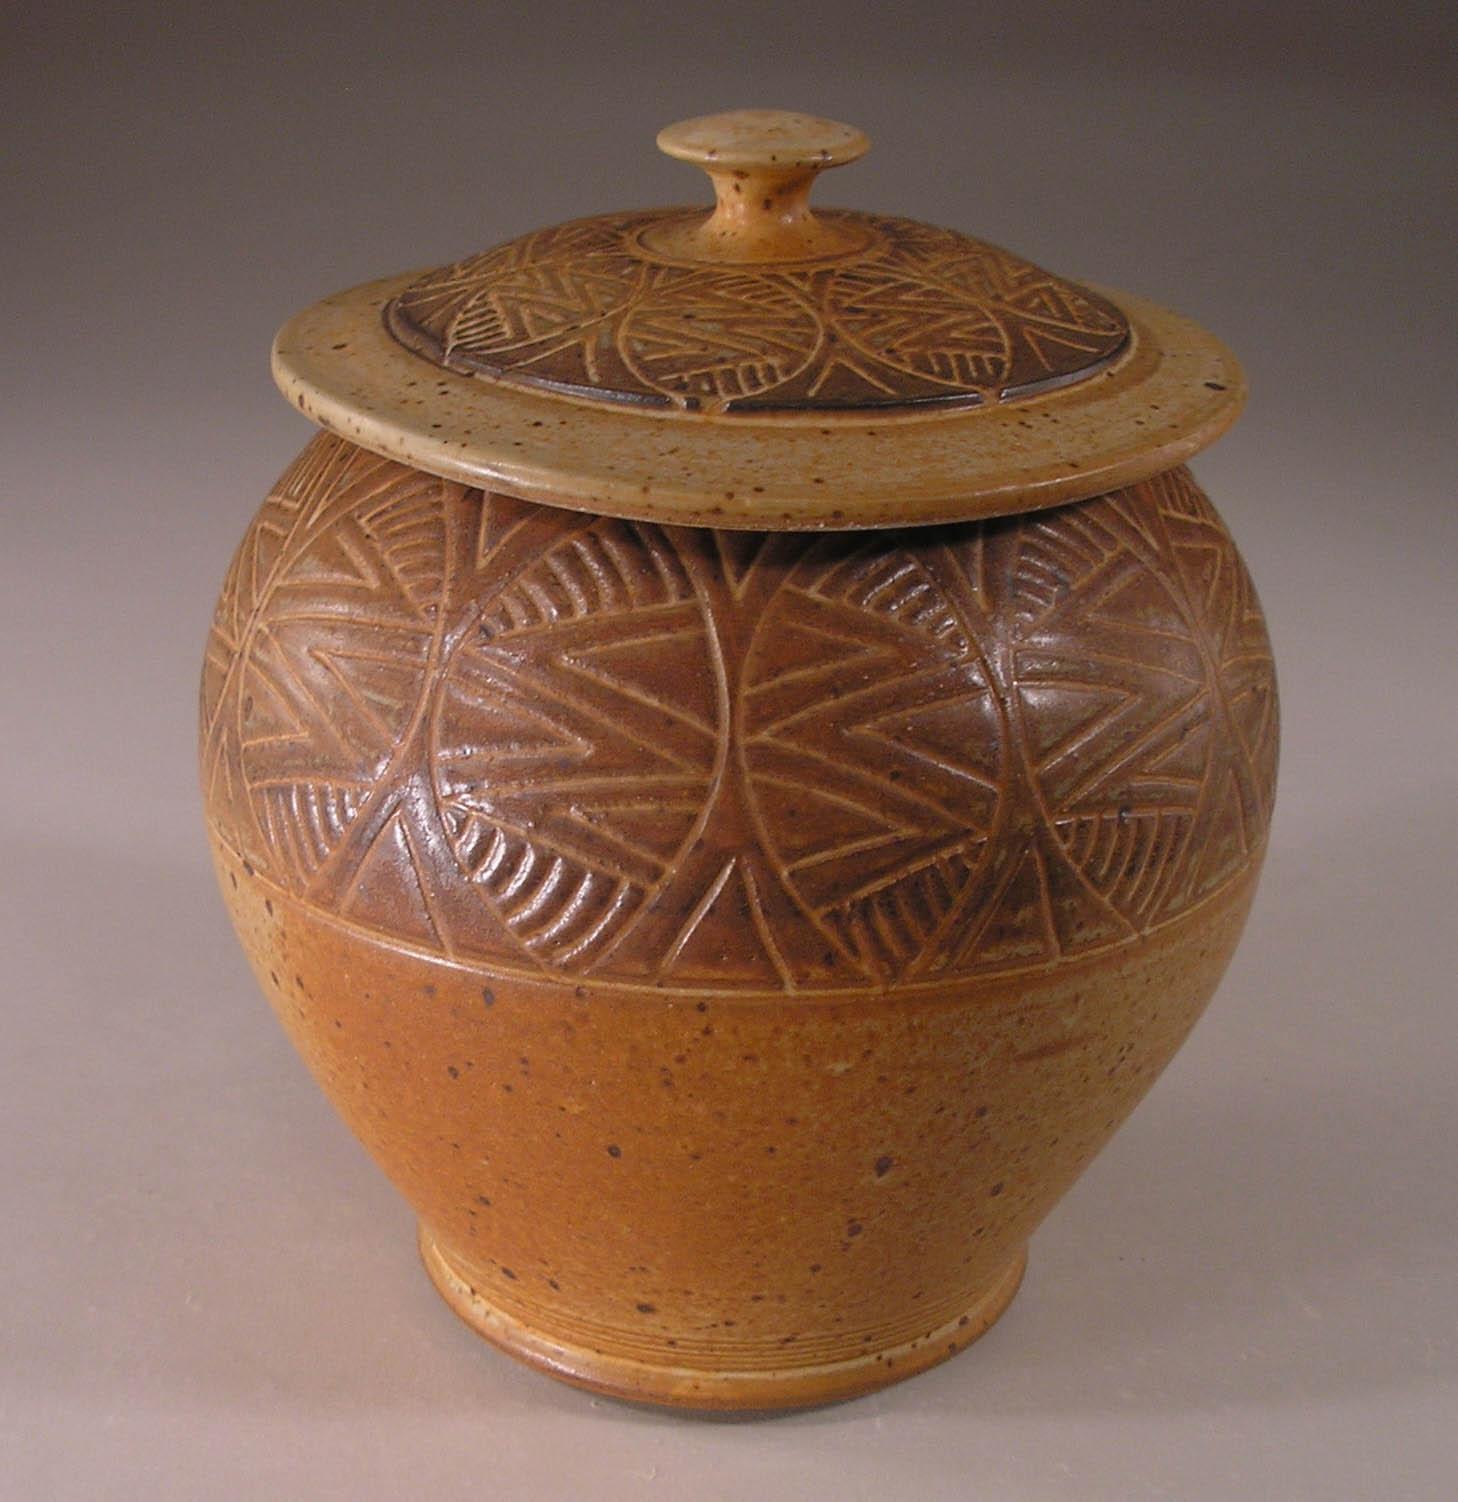 Slip Design Medium Jar